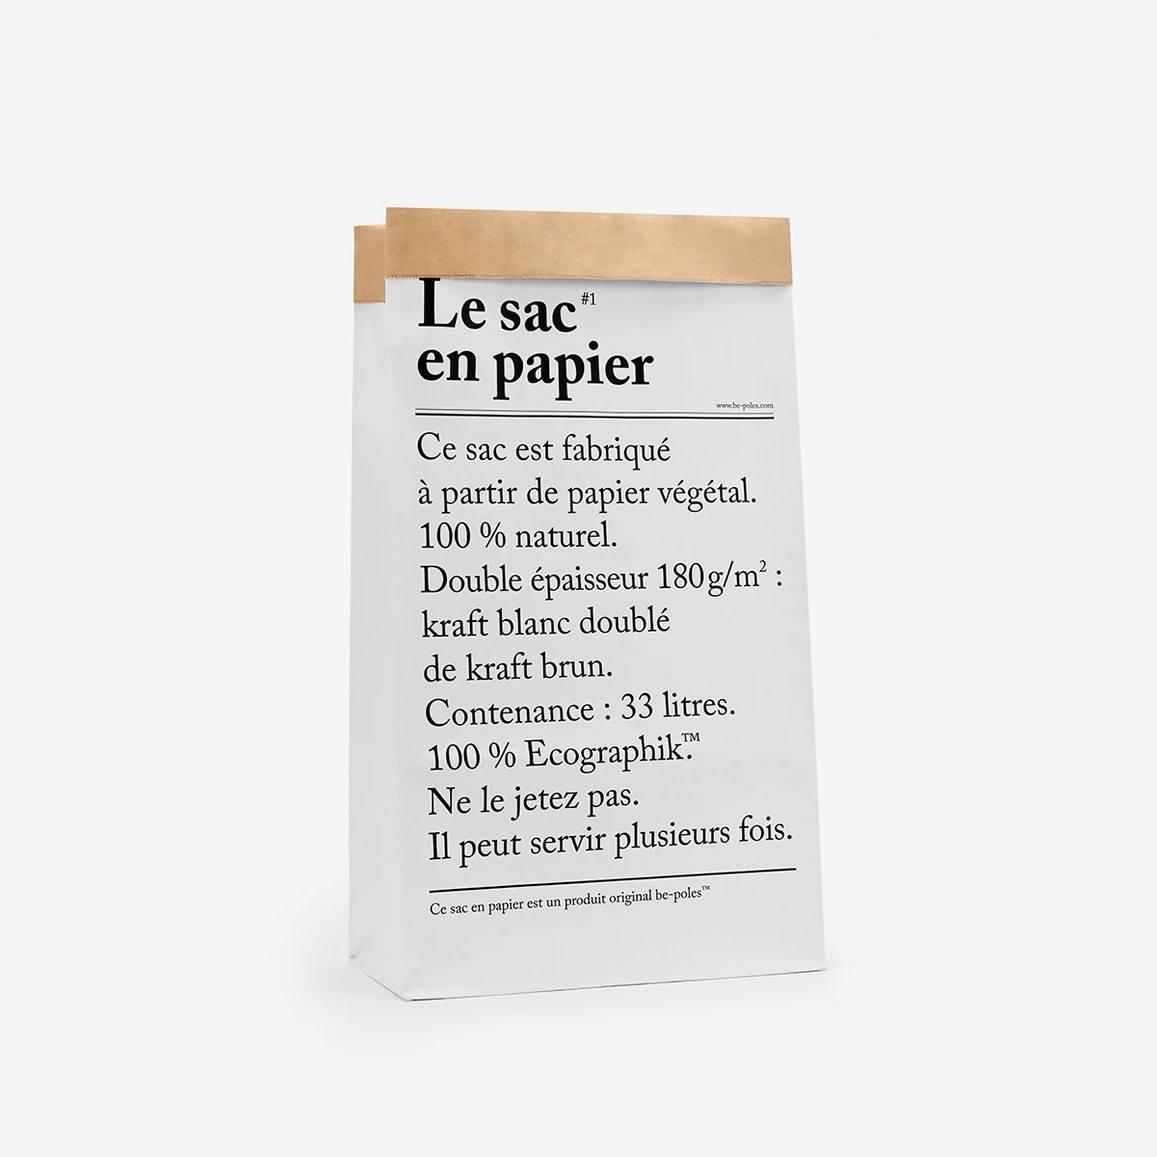 be-pôles Papírový pytel Le Sac En Papier, bílá barva, hnědá barva, papír